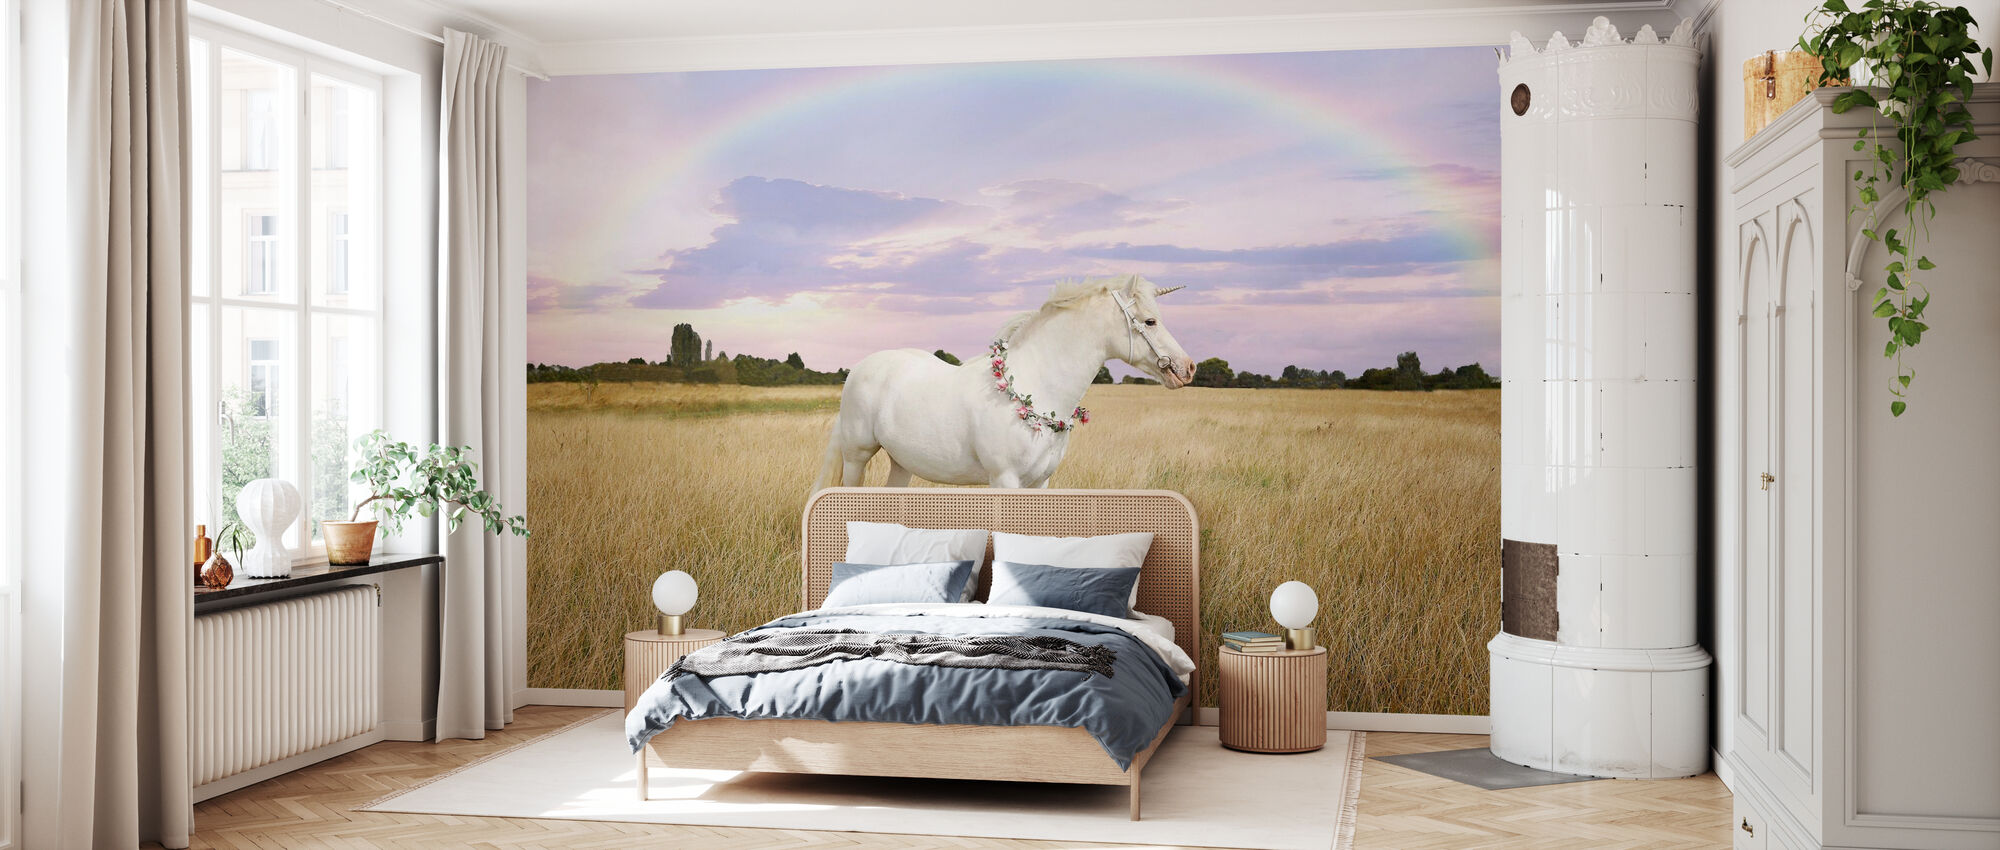 Unicorn and Rainbow - Wallpaper - Bedroom